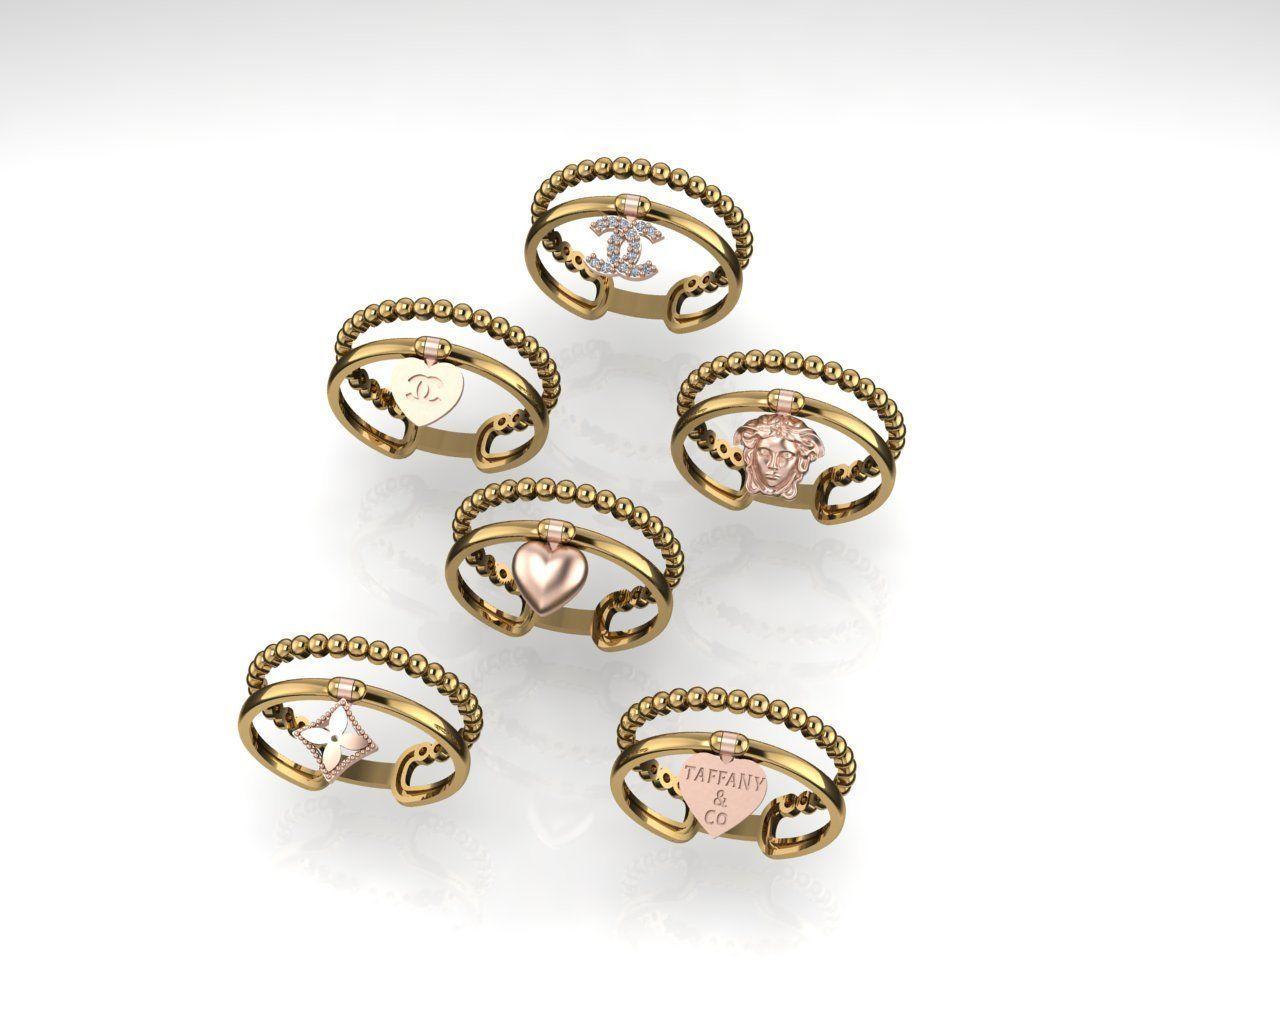 Chanel CC  Versace Tiffany Ring 2020 new